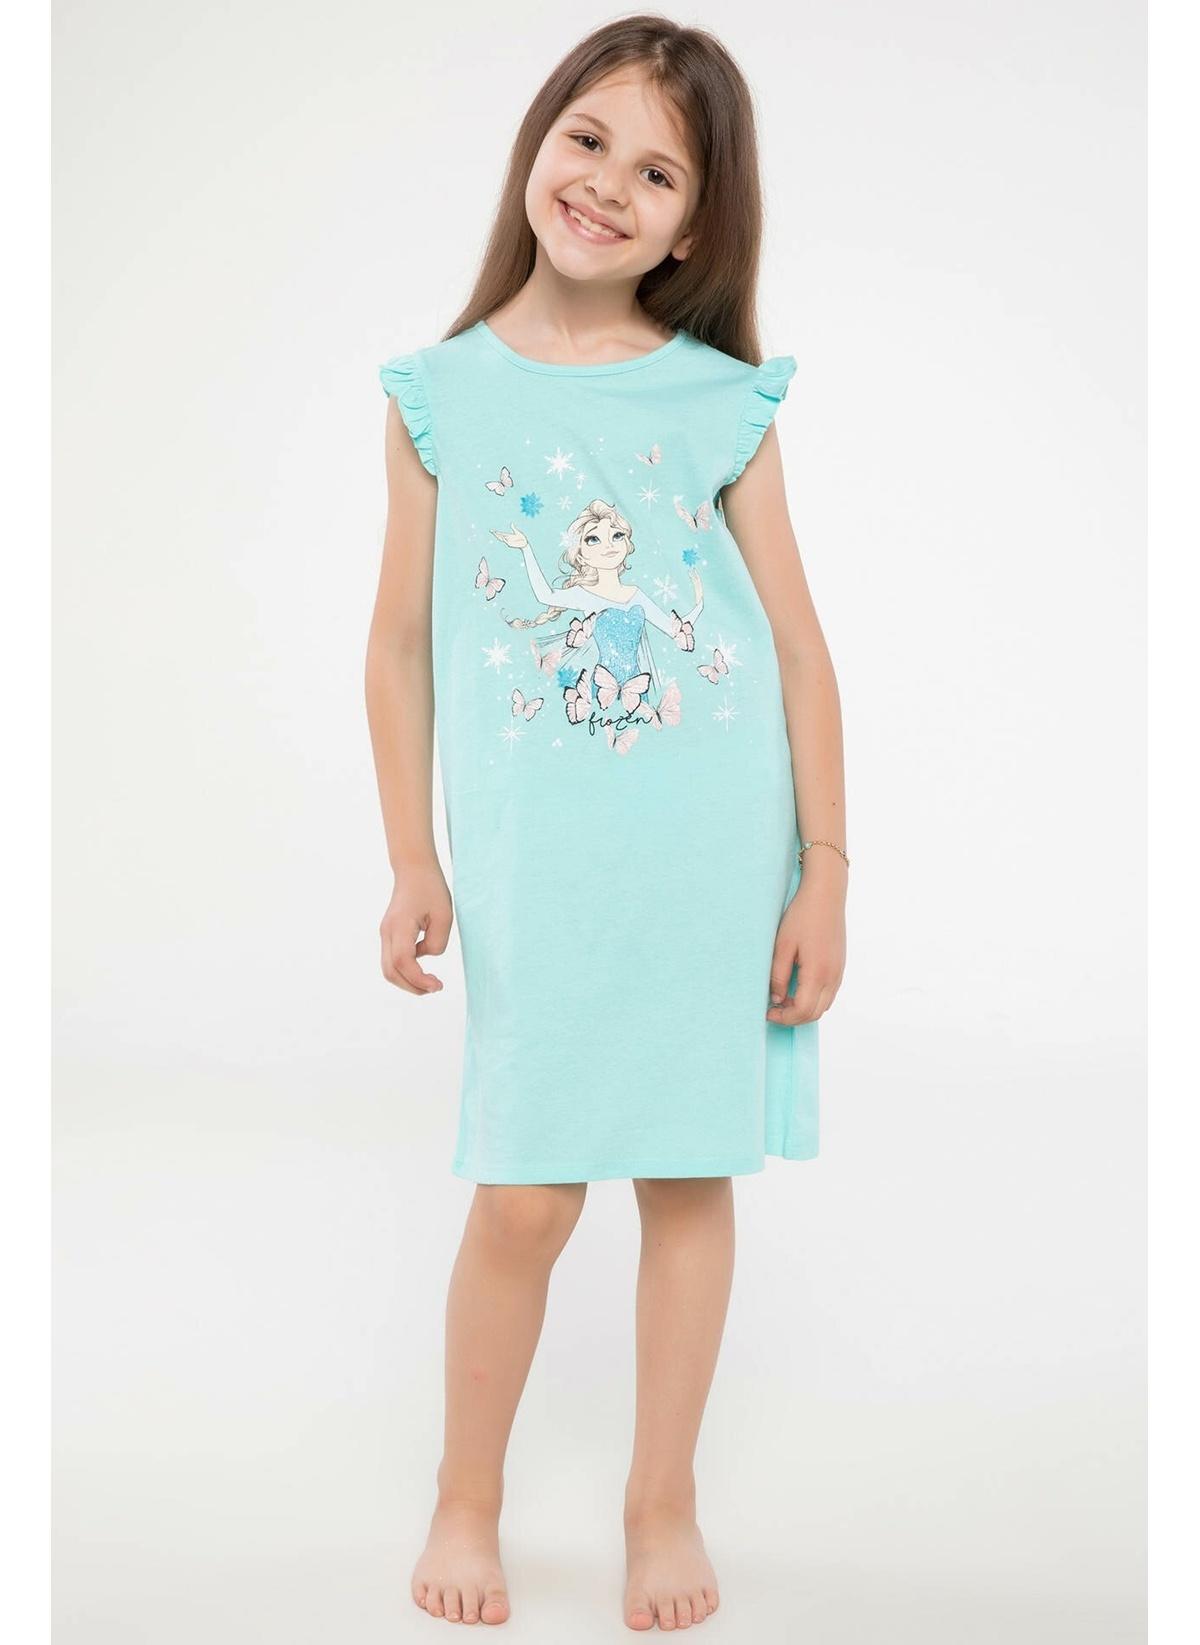 Defacto Lisanslı Frozen Pijama Üstü J5404a618hstr156 Lisanslı Frozen Pijama – 19.99 TL